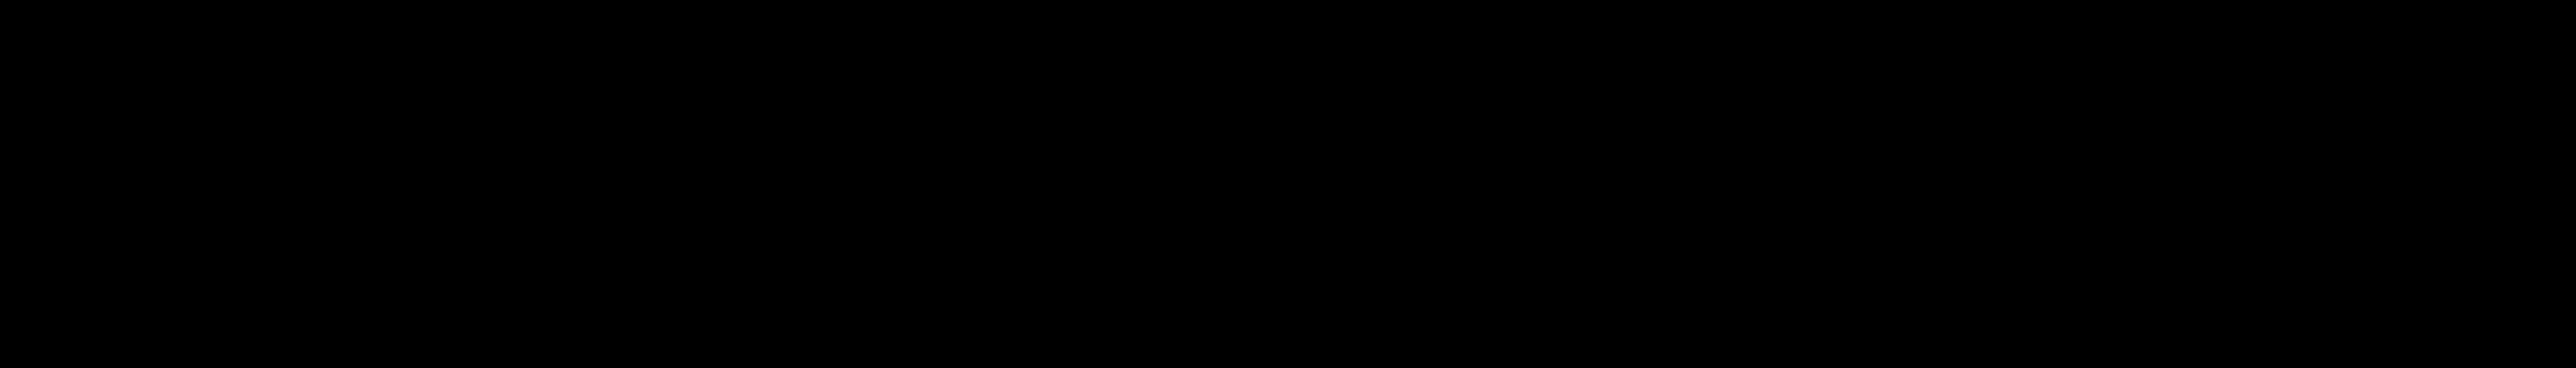 Logos von Viacom CBS, Sky, Decathlon, Red Bull, Discovery, Pilot und Diageo